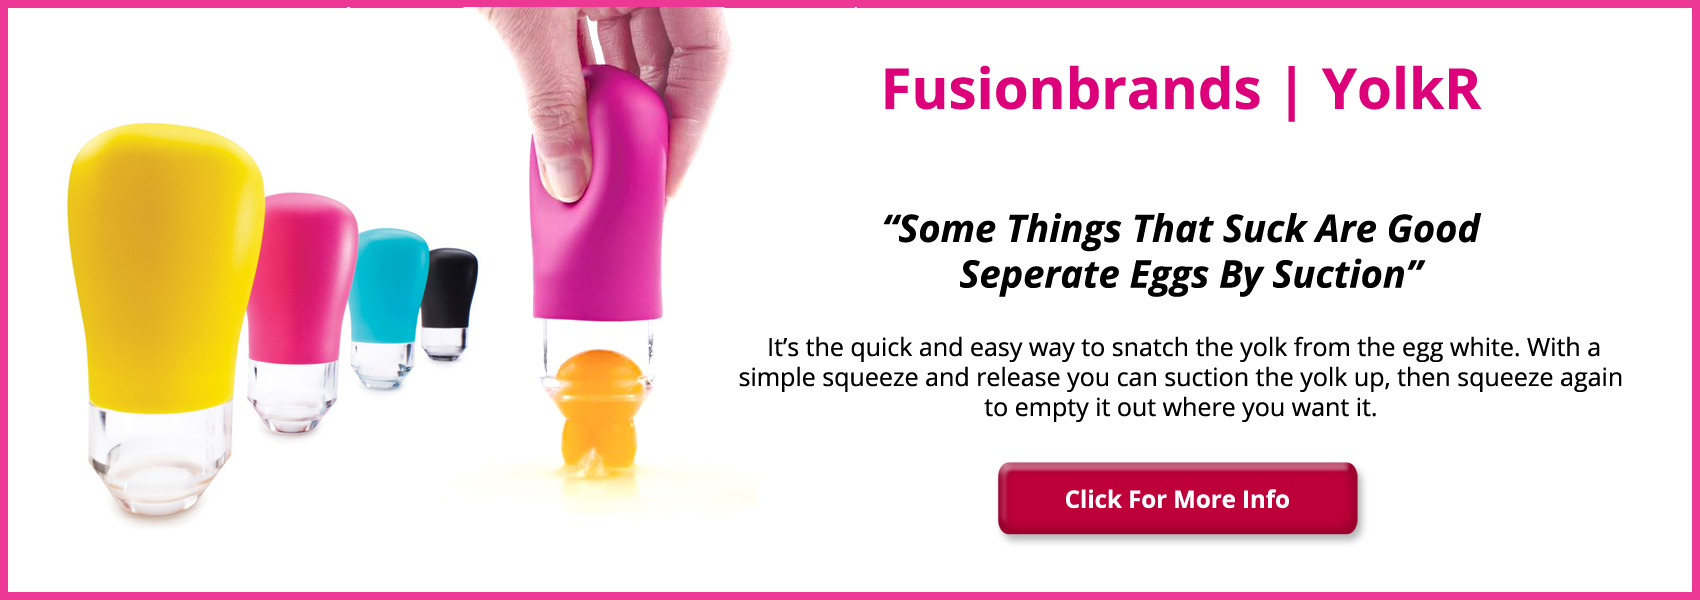 Fusionbrands YolkR1